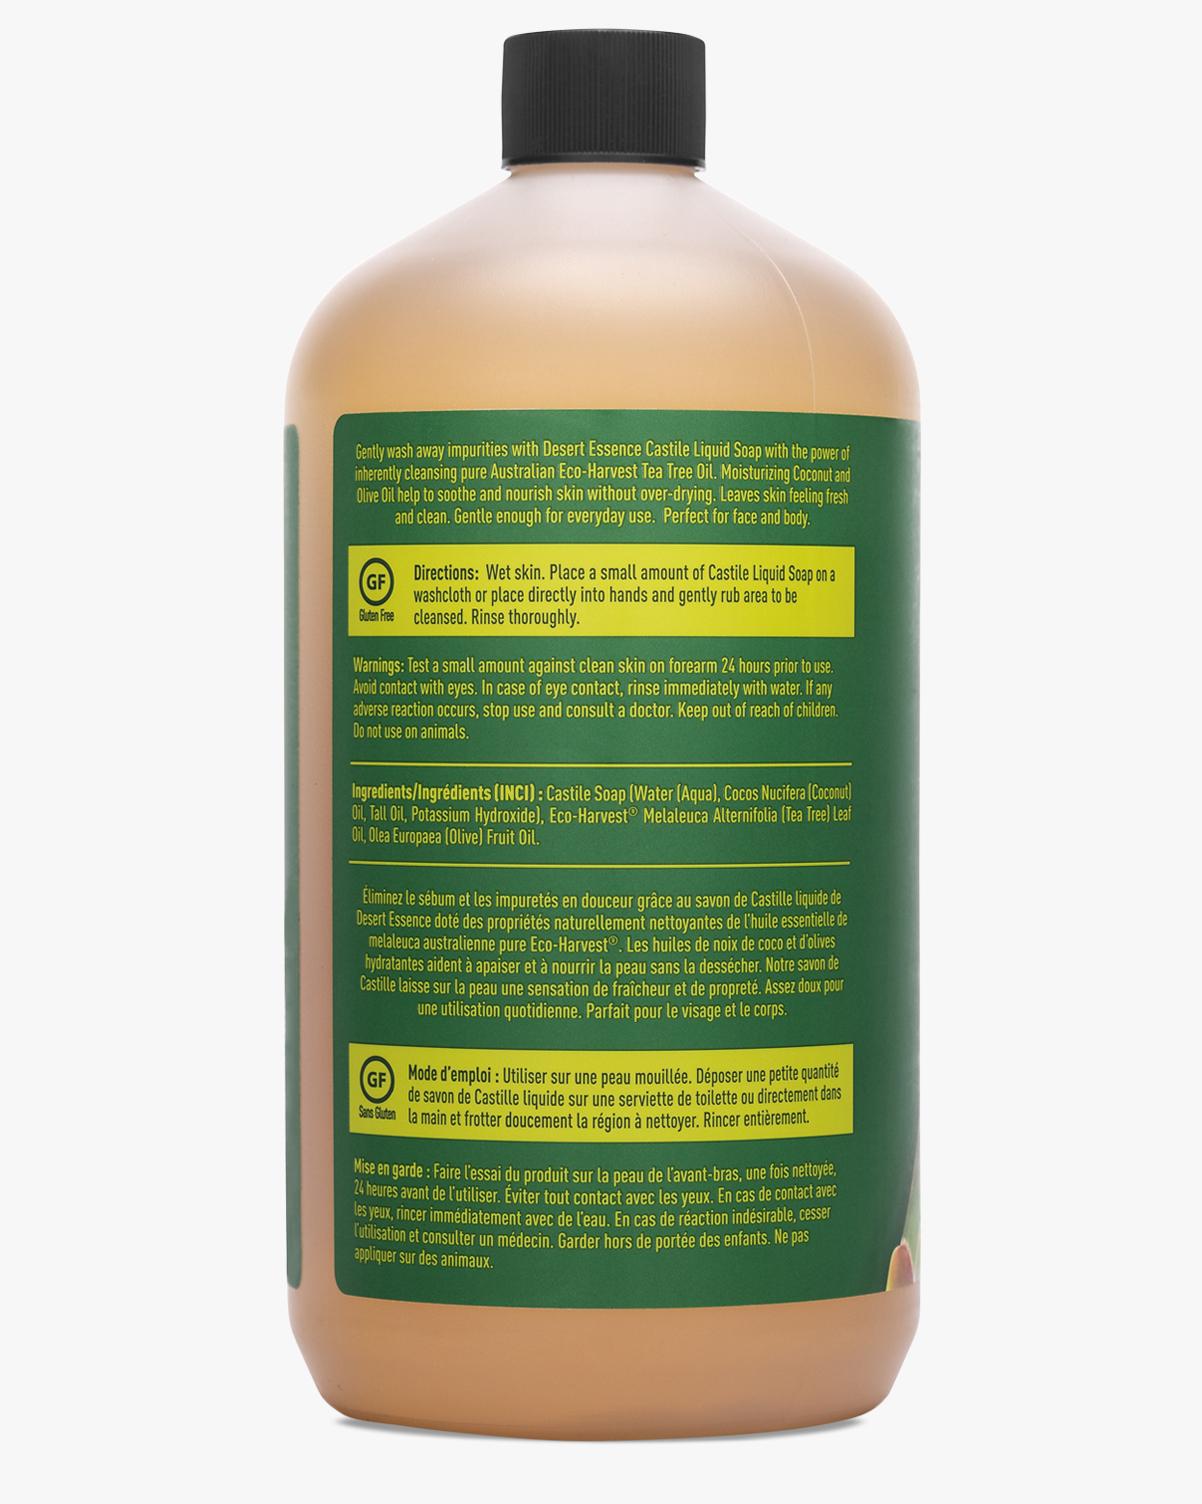 Un Toilette Ou Une Toilette desert essence tea tree oil liquid castile soap refill, 32 fl. oz. | vegan  | gluten-free